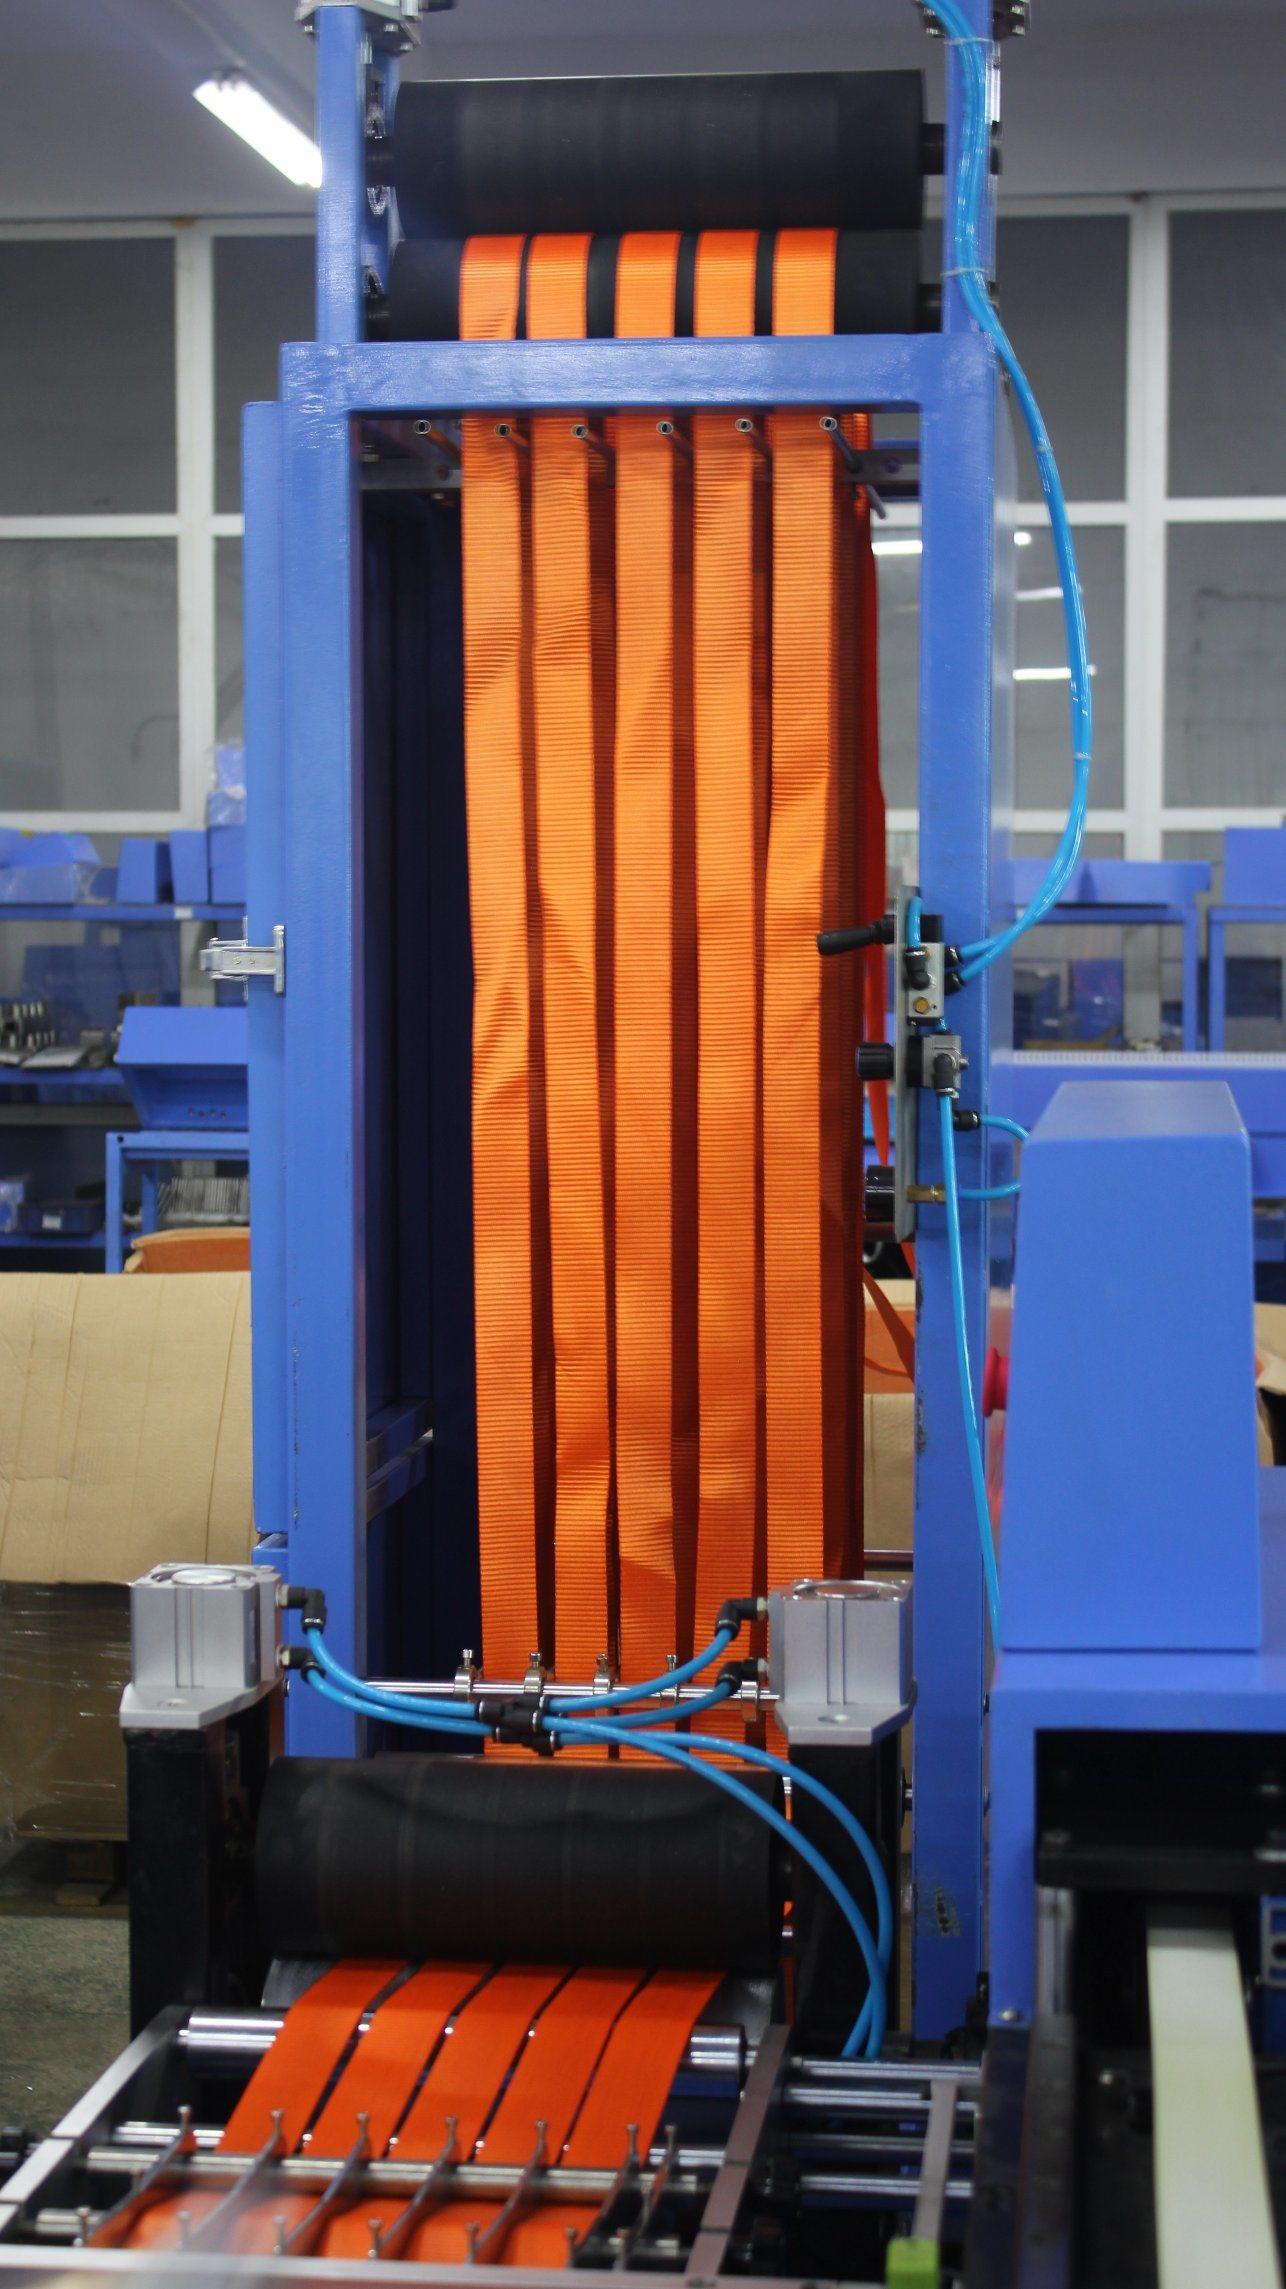 Low MOQ for 6 Heads Labels Winding Machine - Fully Servo Screen Printing Machine for Lashing Straps – Kin Wah